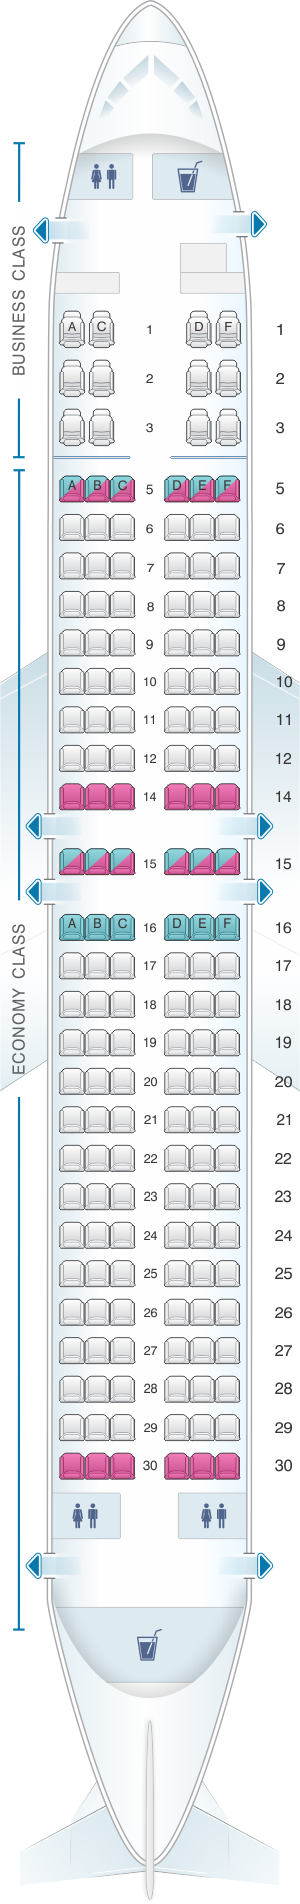 Seat map for SilkAir Boeing B737 800